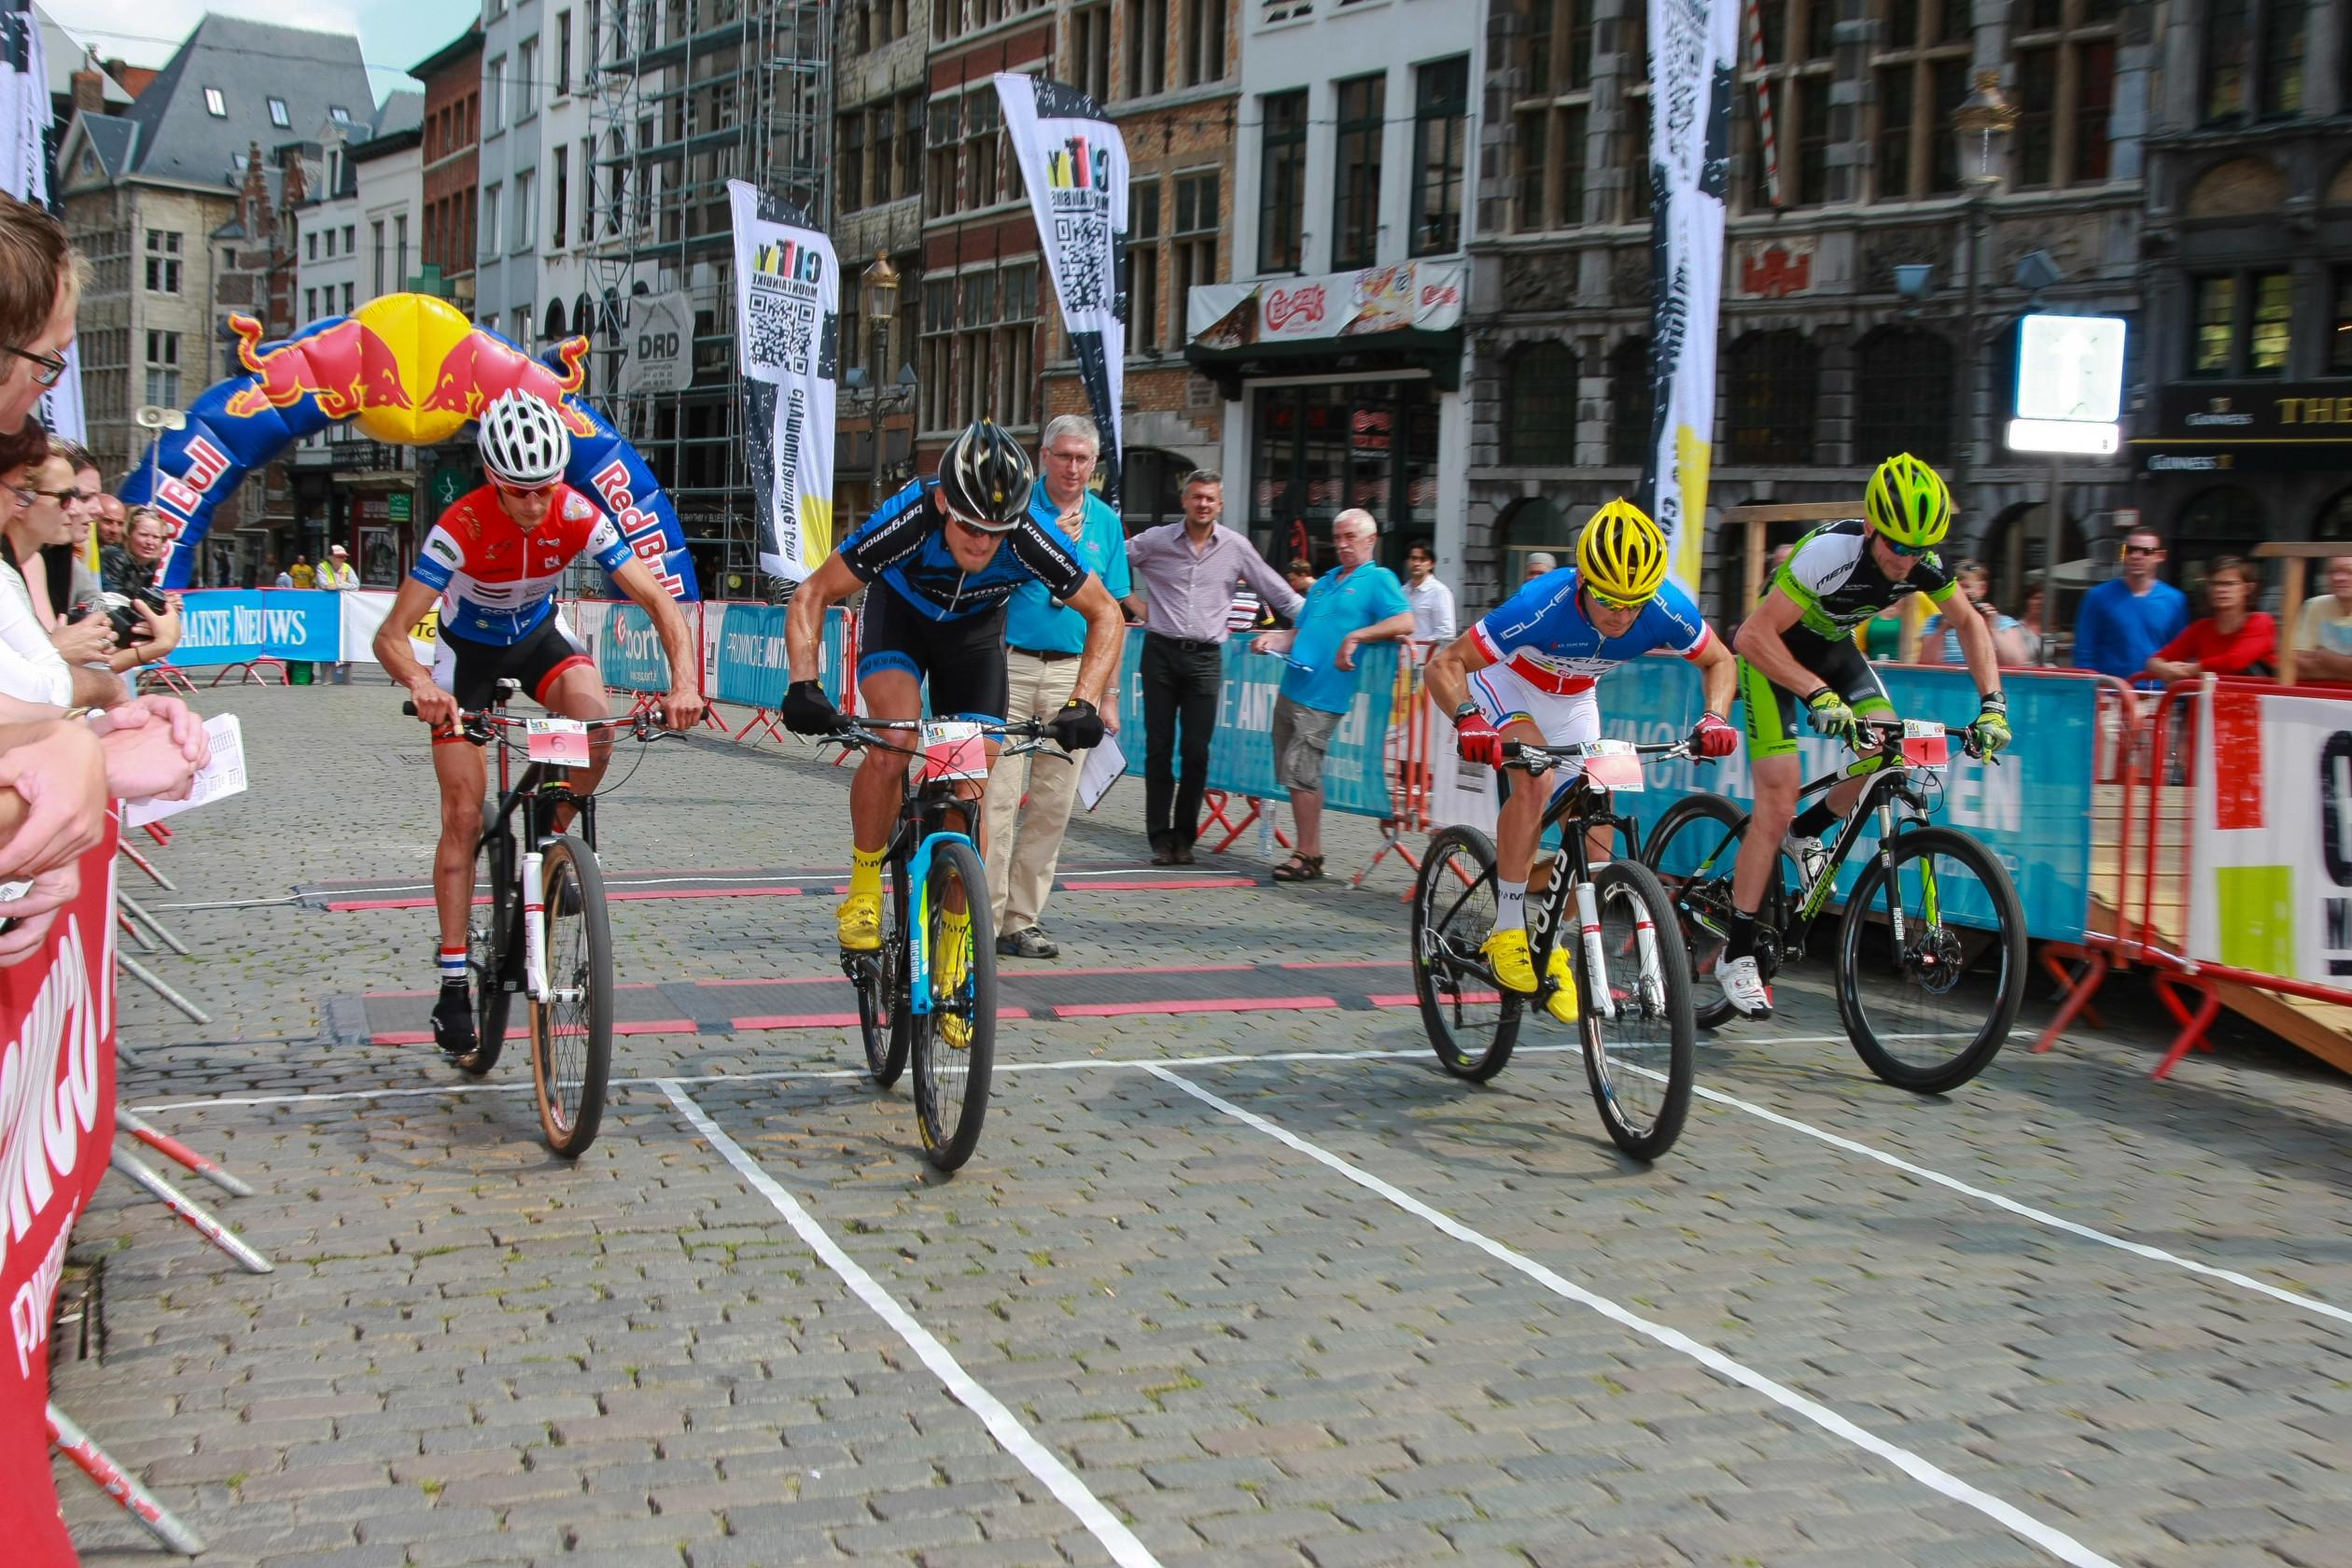 City MTB – UCI Eliminator 300 DPIAntwerpen 2014GLPE160614 21